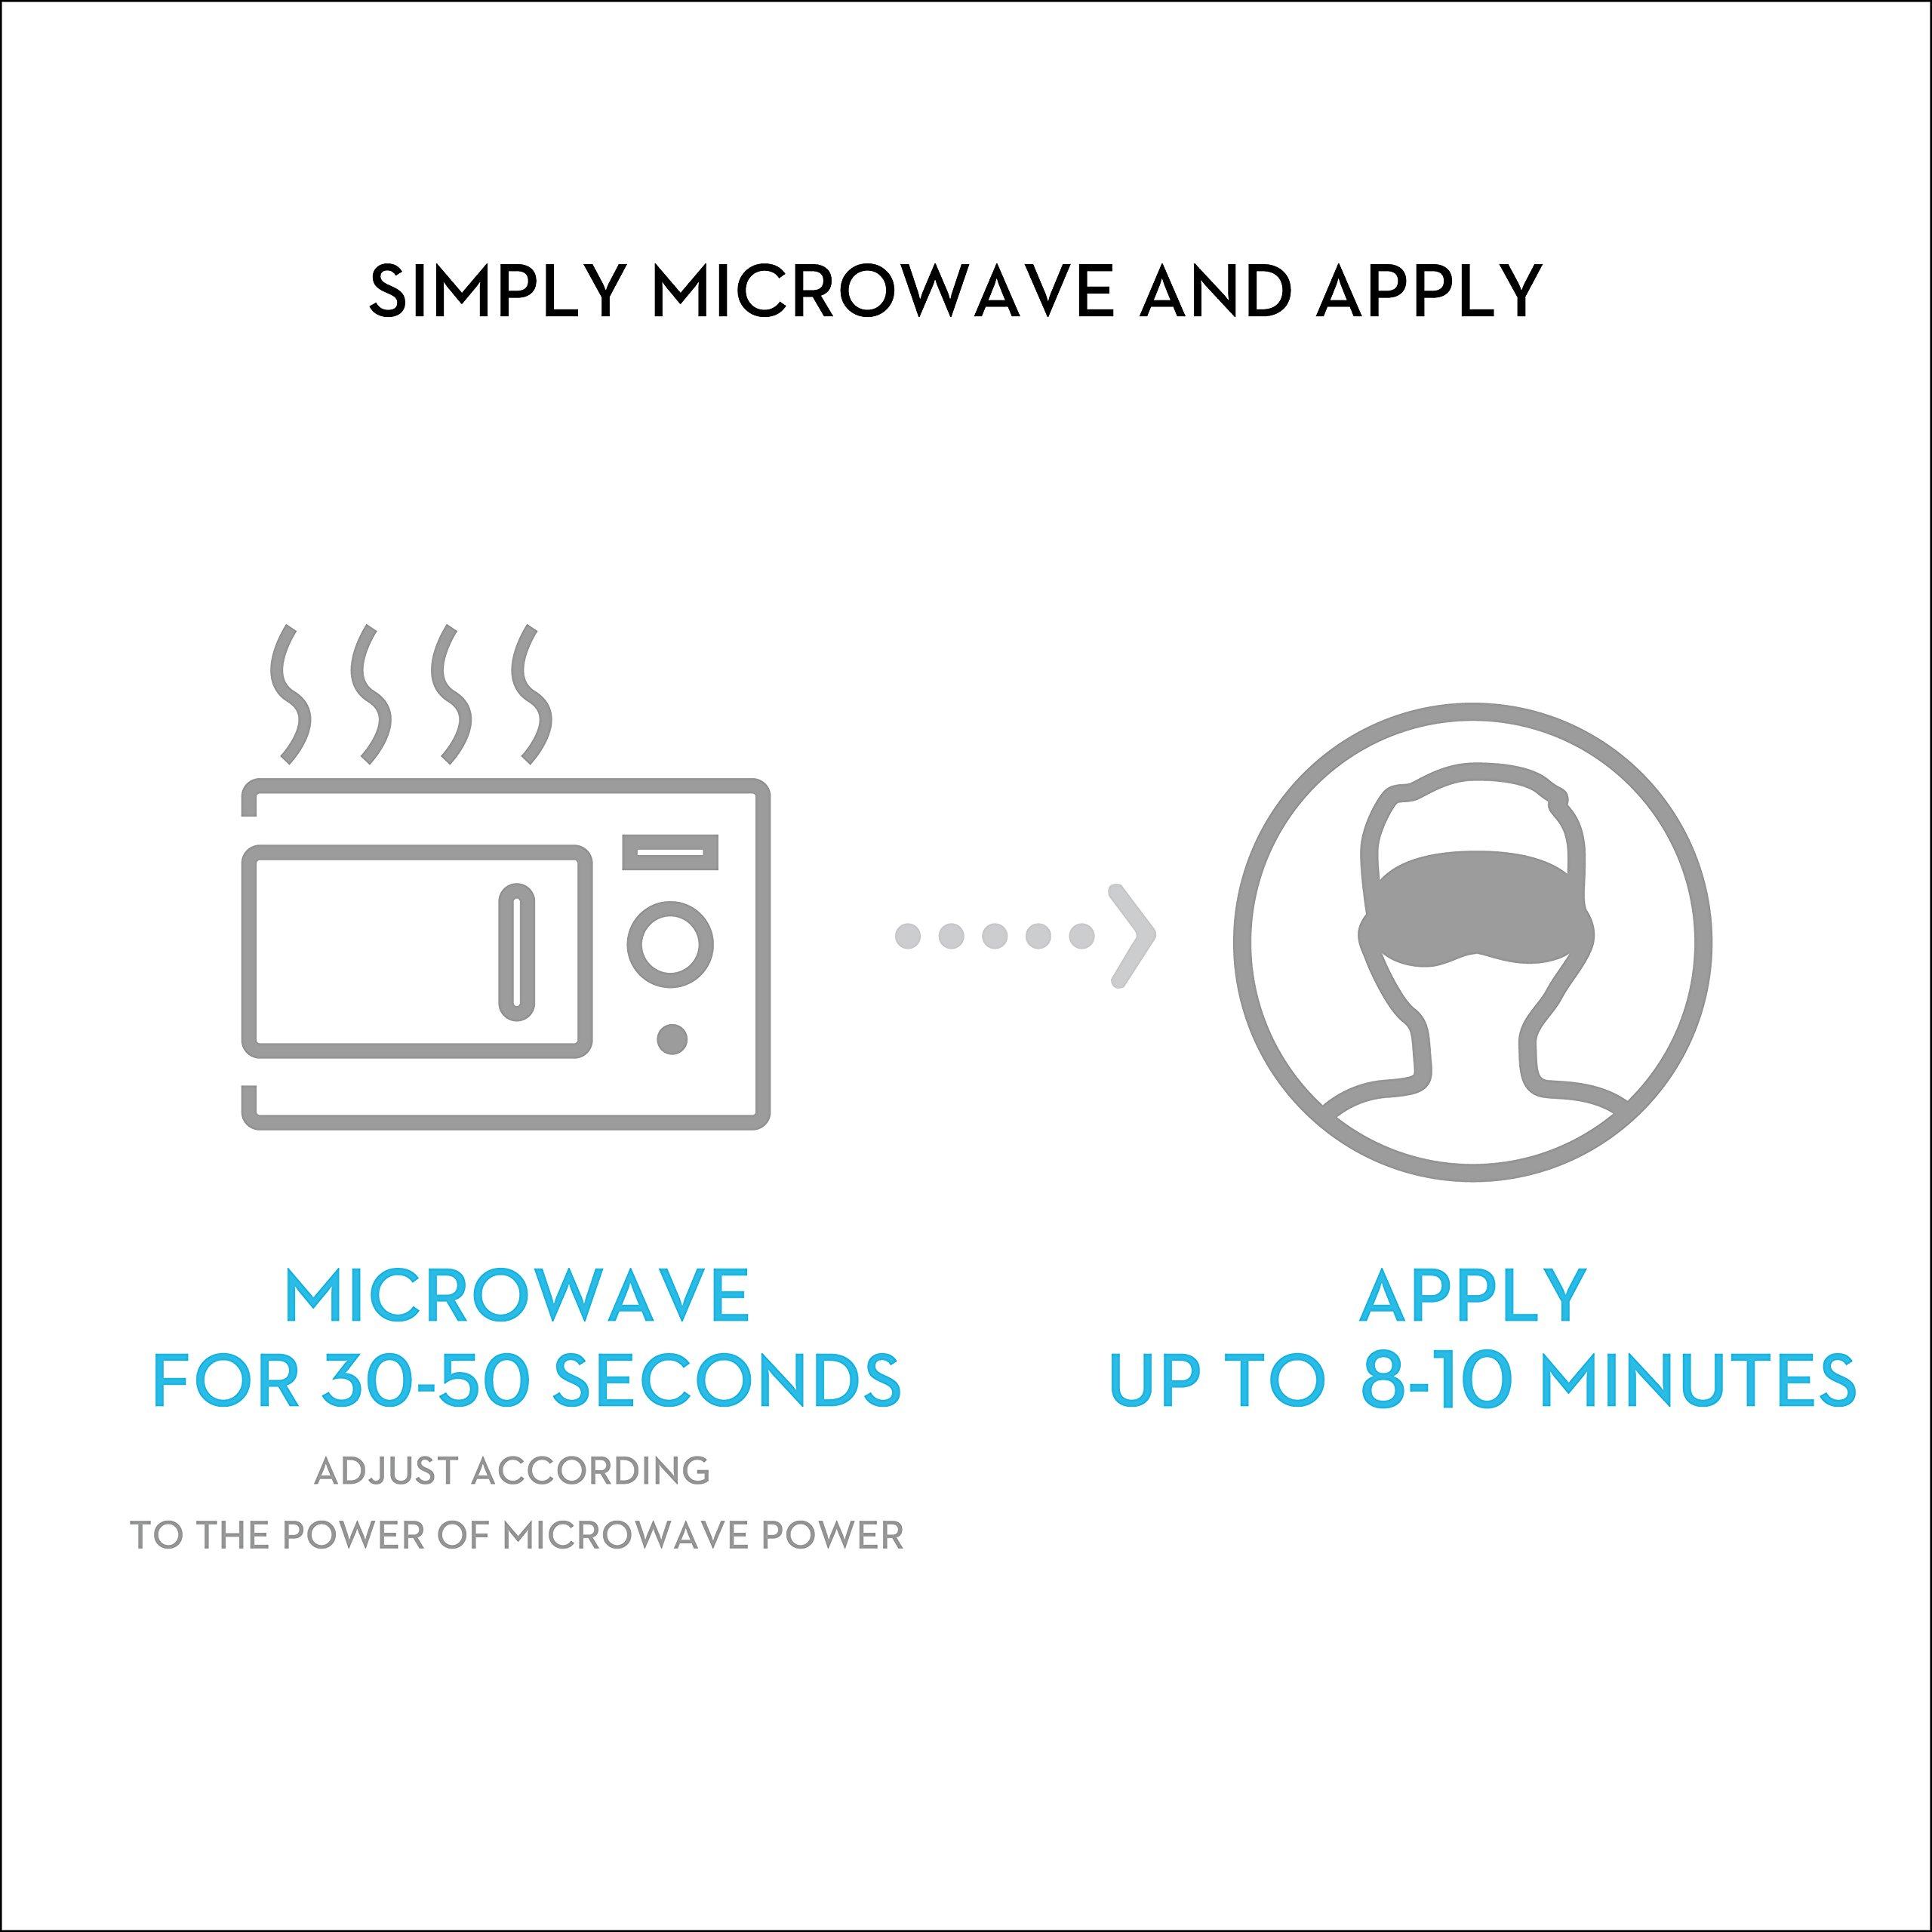 Kimkoo Eye Compress Moist Heat &Dry Eye Mask - Microwave Heating Pad,Washable and Reusable